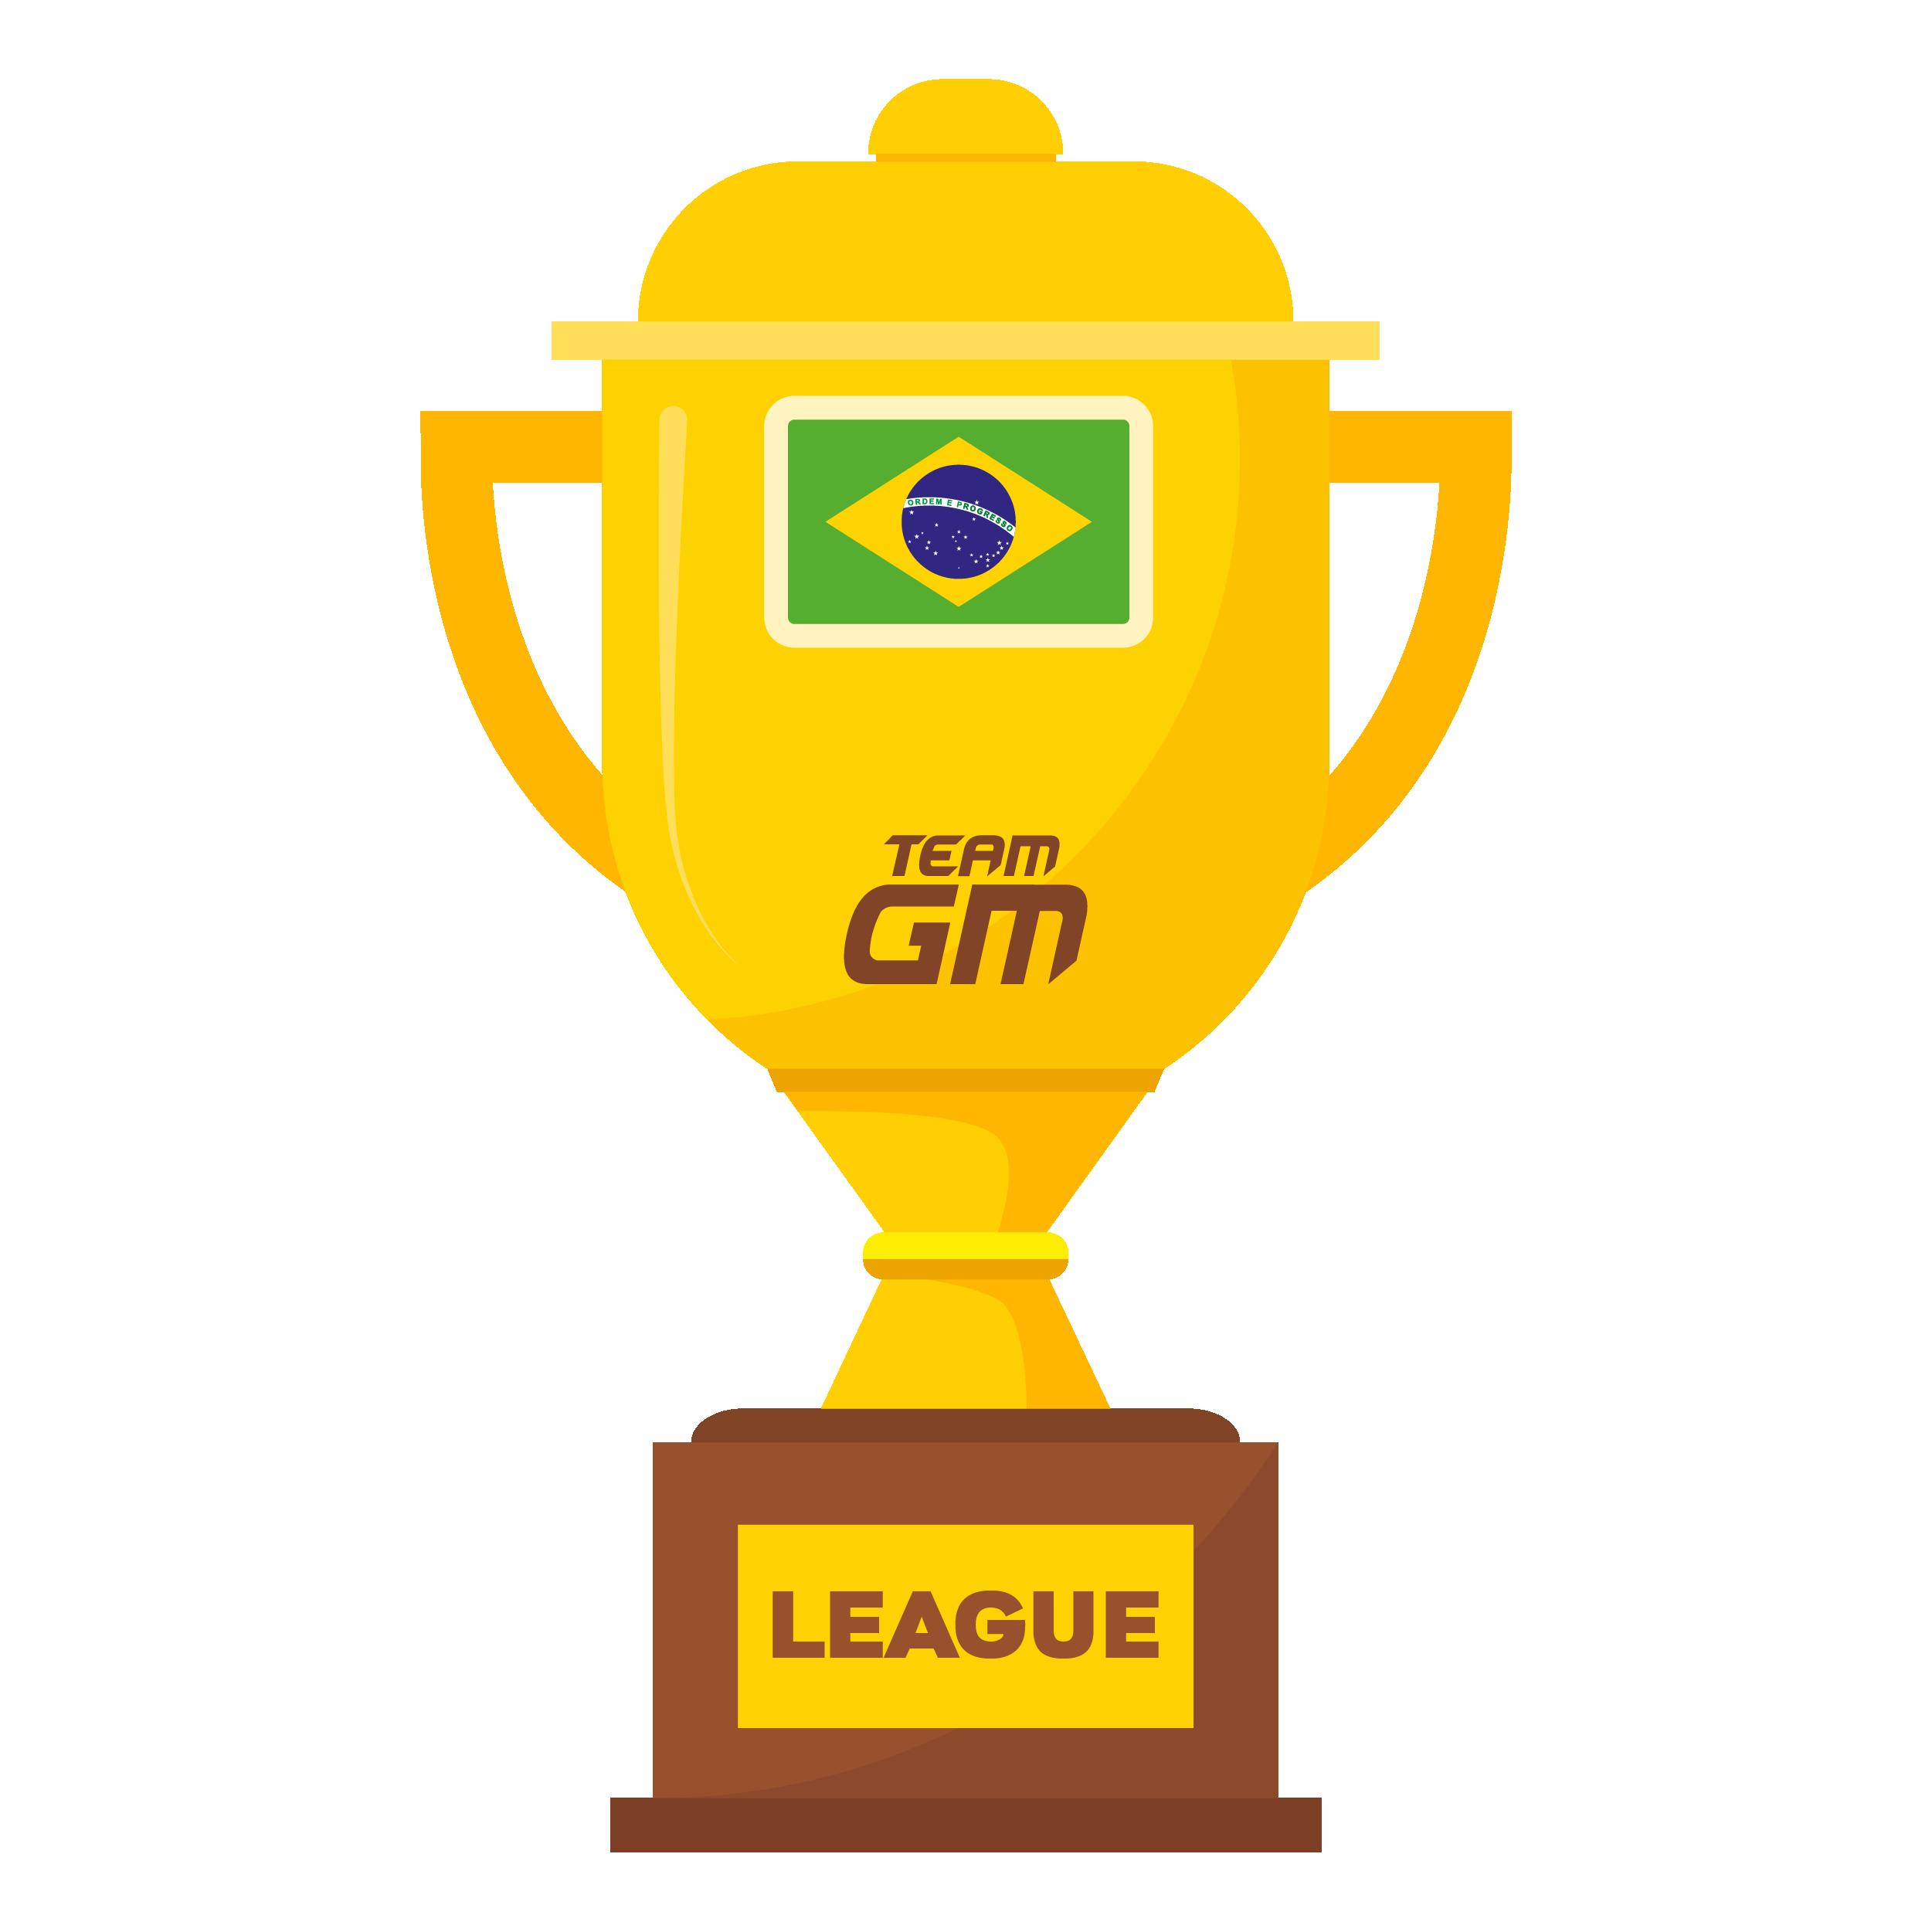 2ND - BRAZILIAN SUPER LEAGUE